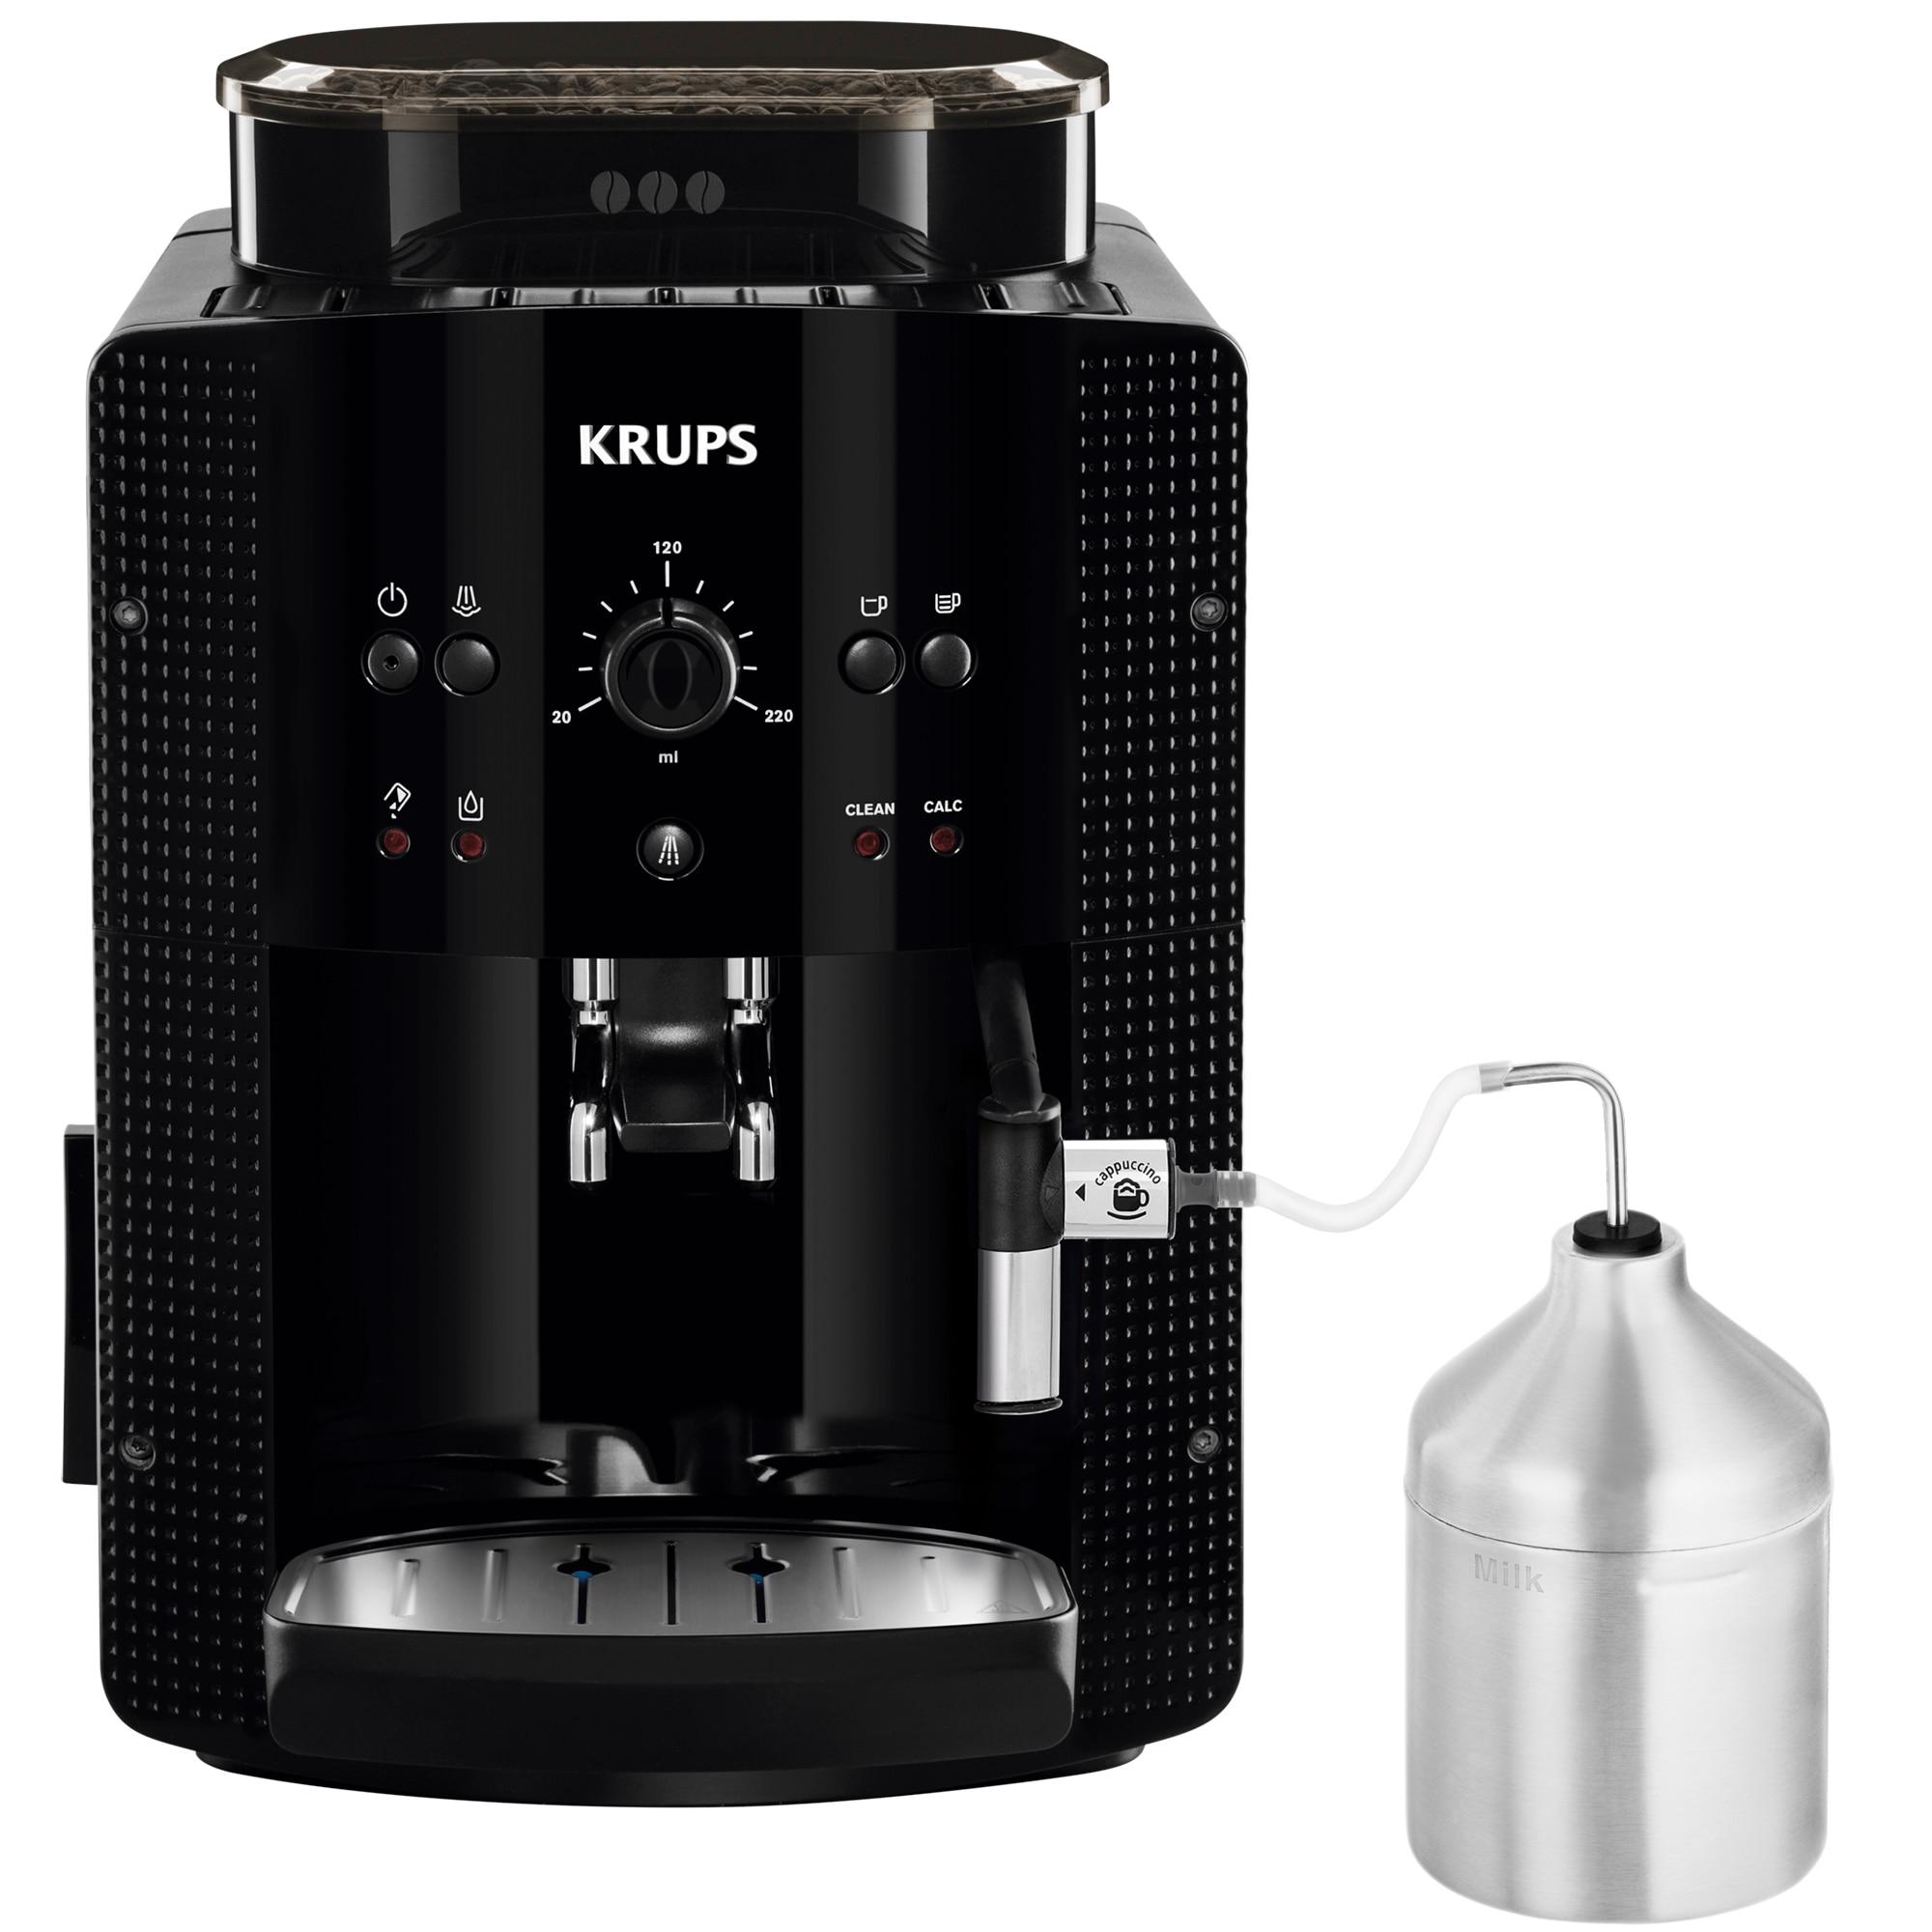 Fotografie Espressor automat Krups EA81M870 Essential, 1450 W, 15 bar, Recipient Lapte, rasnita metal, Thermoblock, Negru